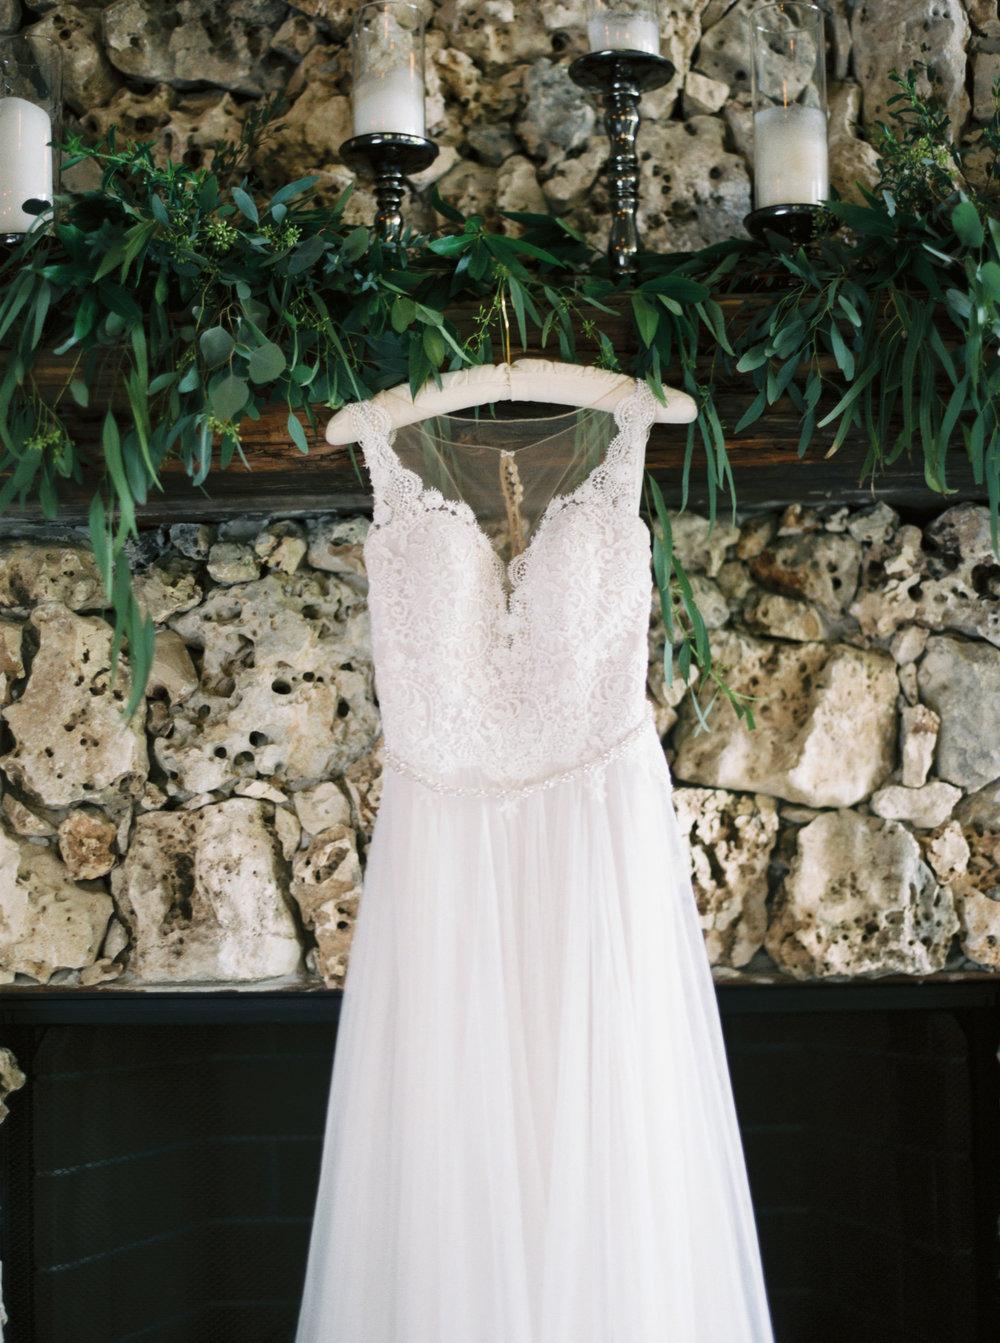 The-Creek-Haus-Wedding-Dripping-Springs-8.jpg